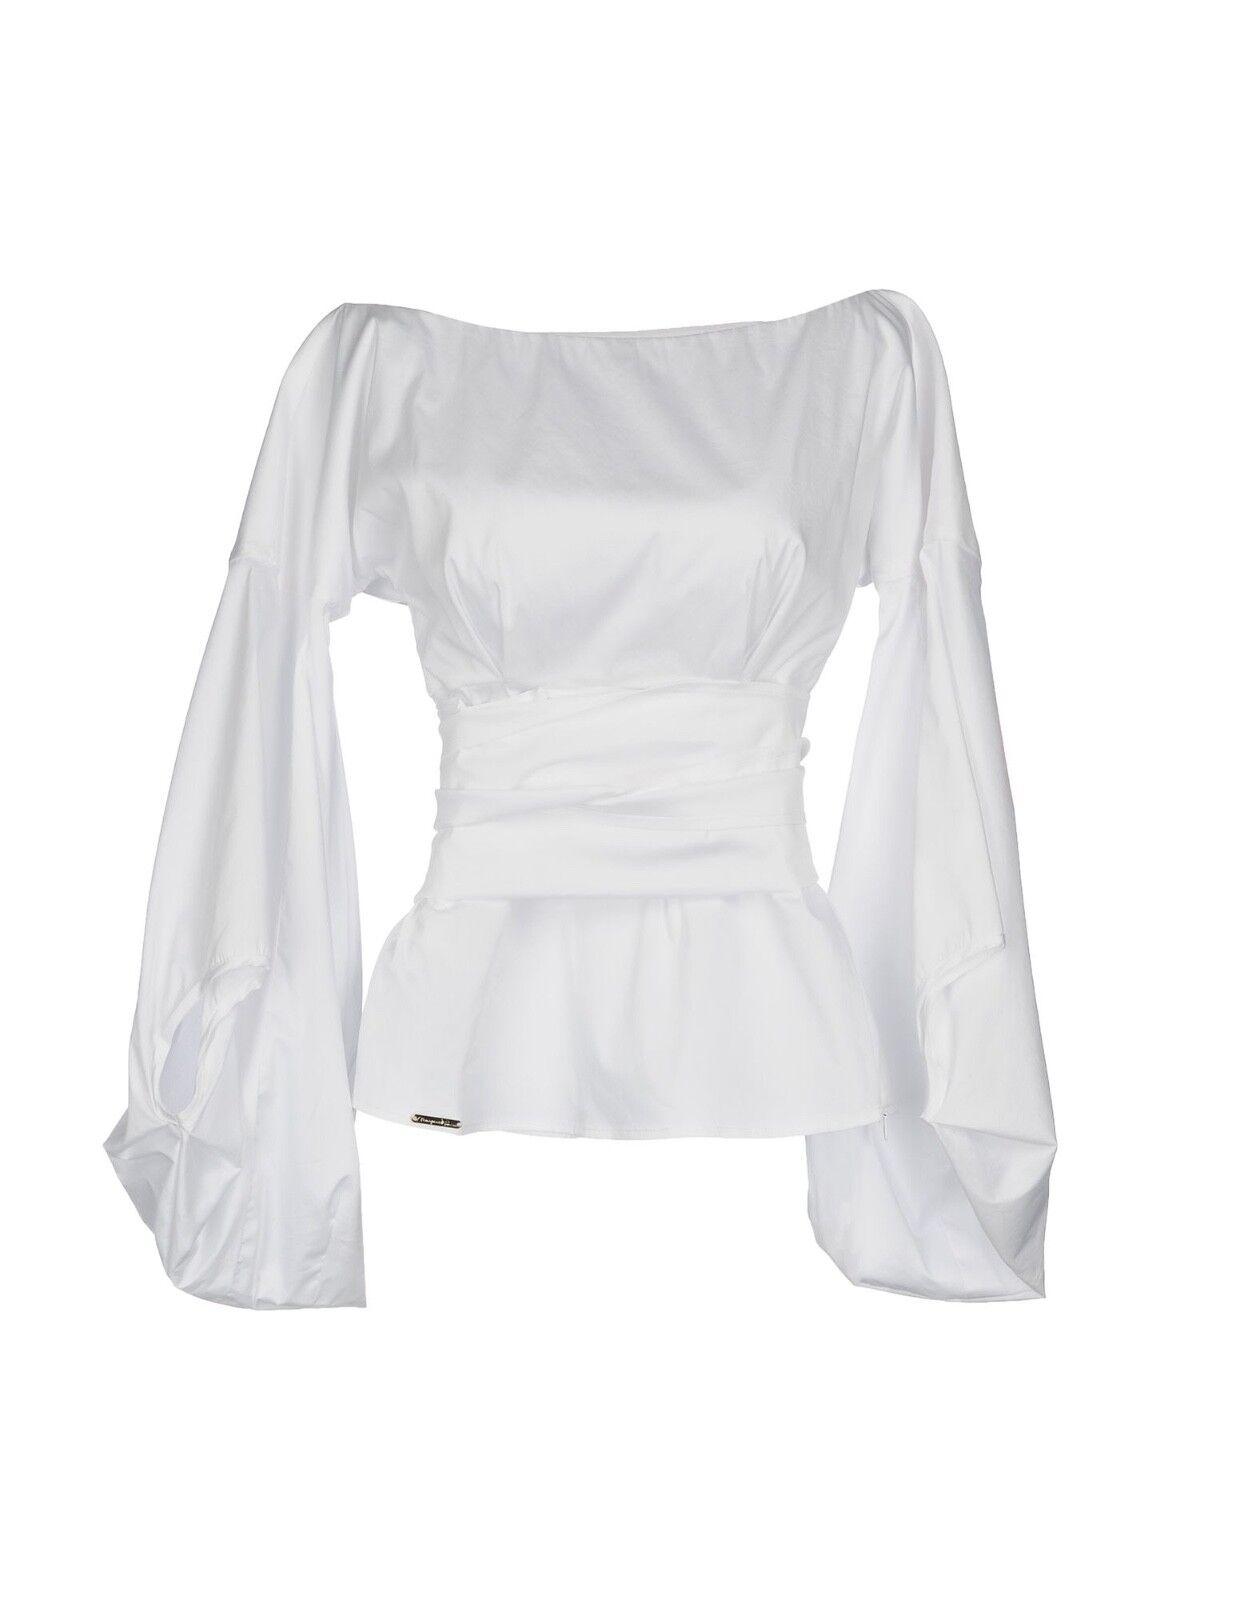 Mariagrazia Panizzi Weiß Blouse Off the Shoulders Größe   IT48 10-12